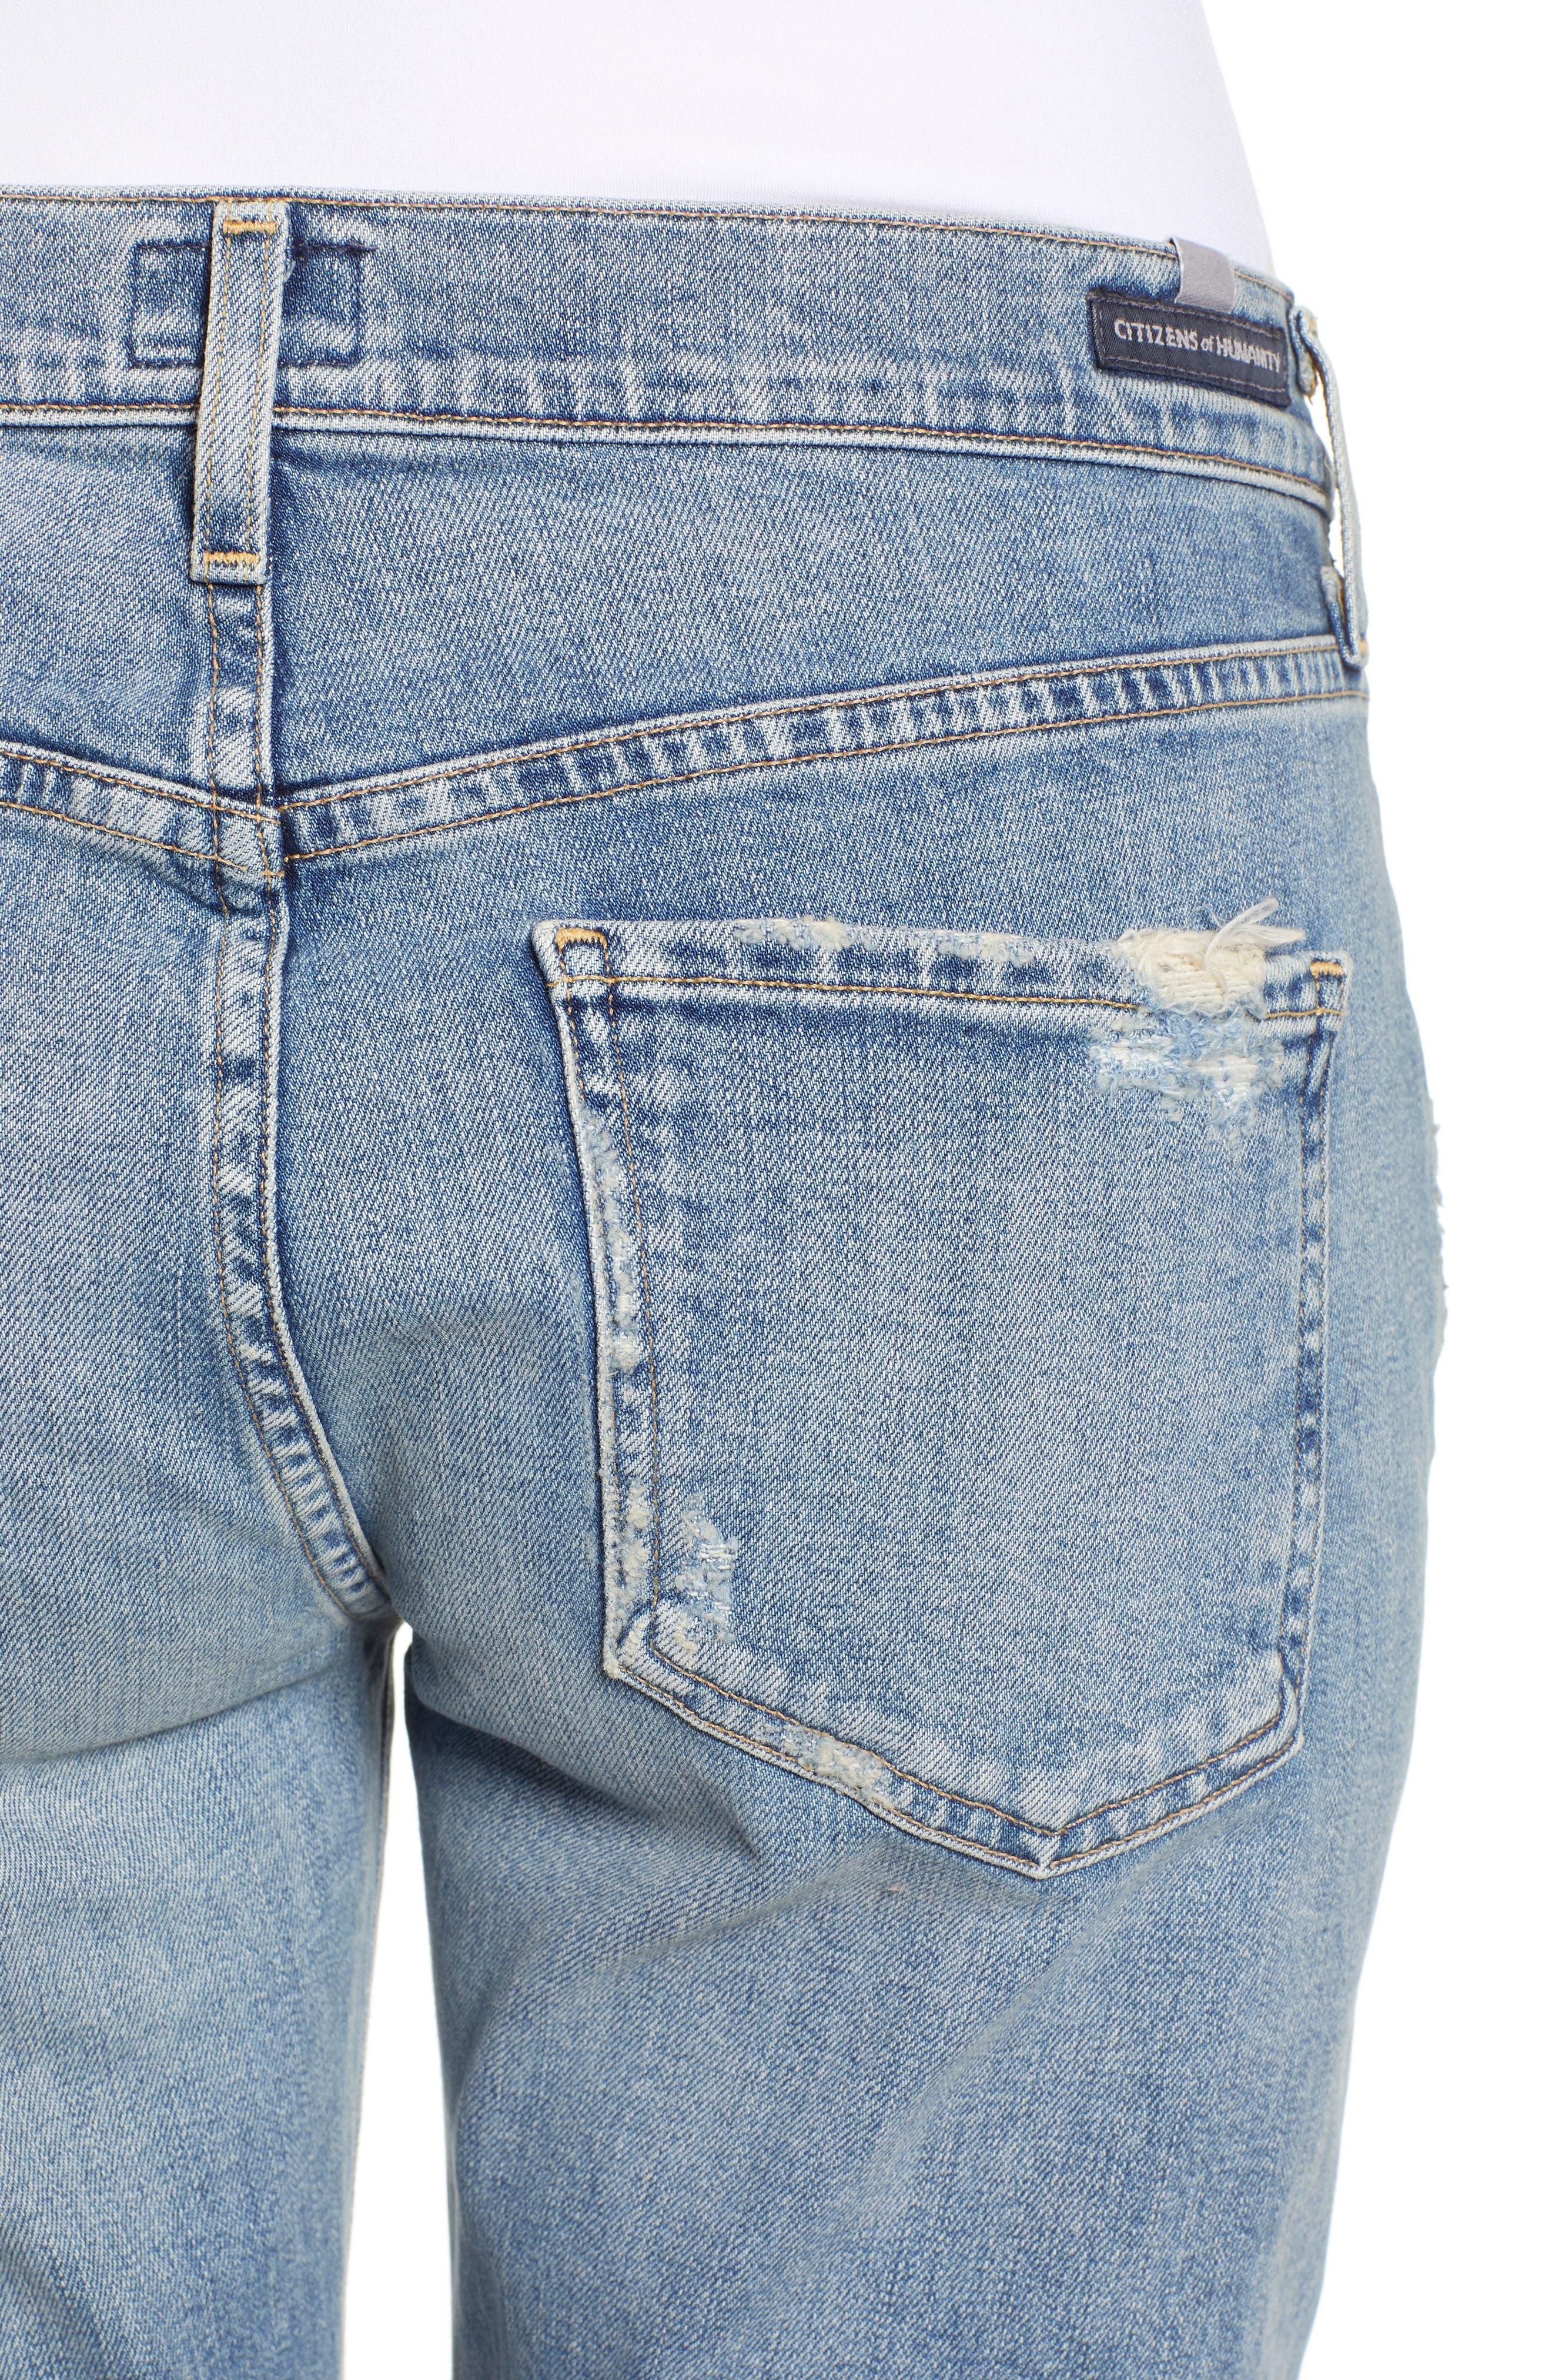 CITIZENS OF HUMANITY, Emerson Crop Slim Fit Boyfriend Jeans, Alternate thumbnail 5, color, MARINA